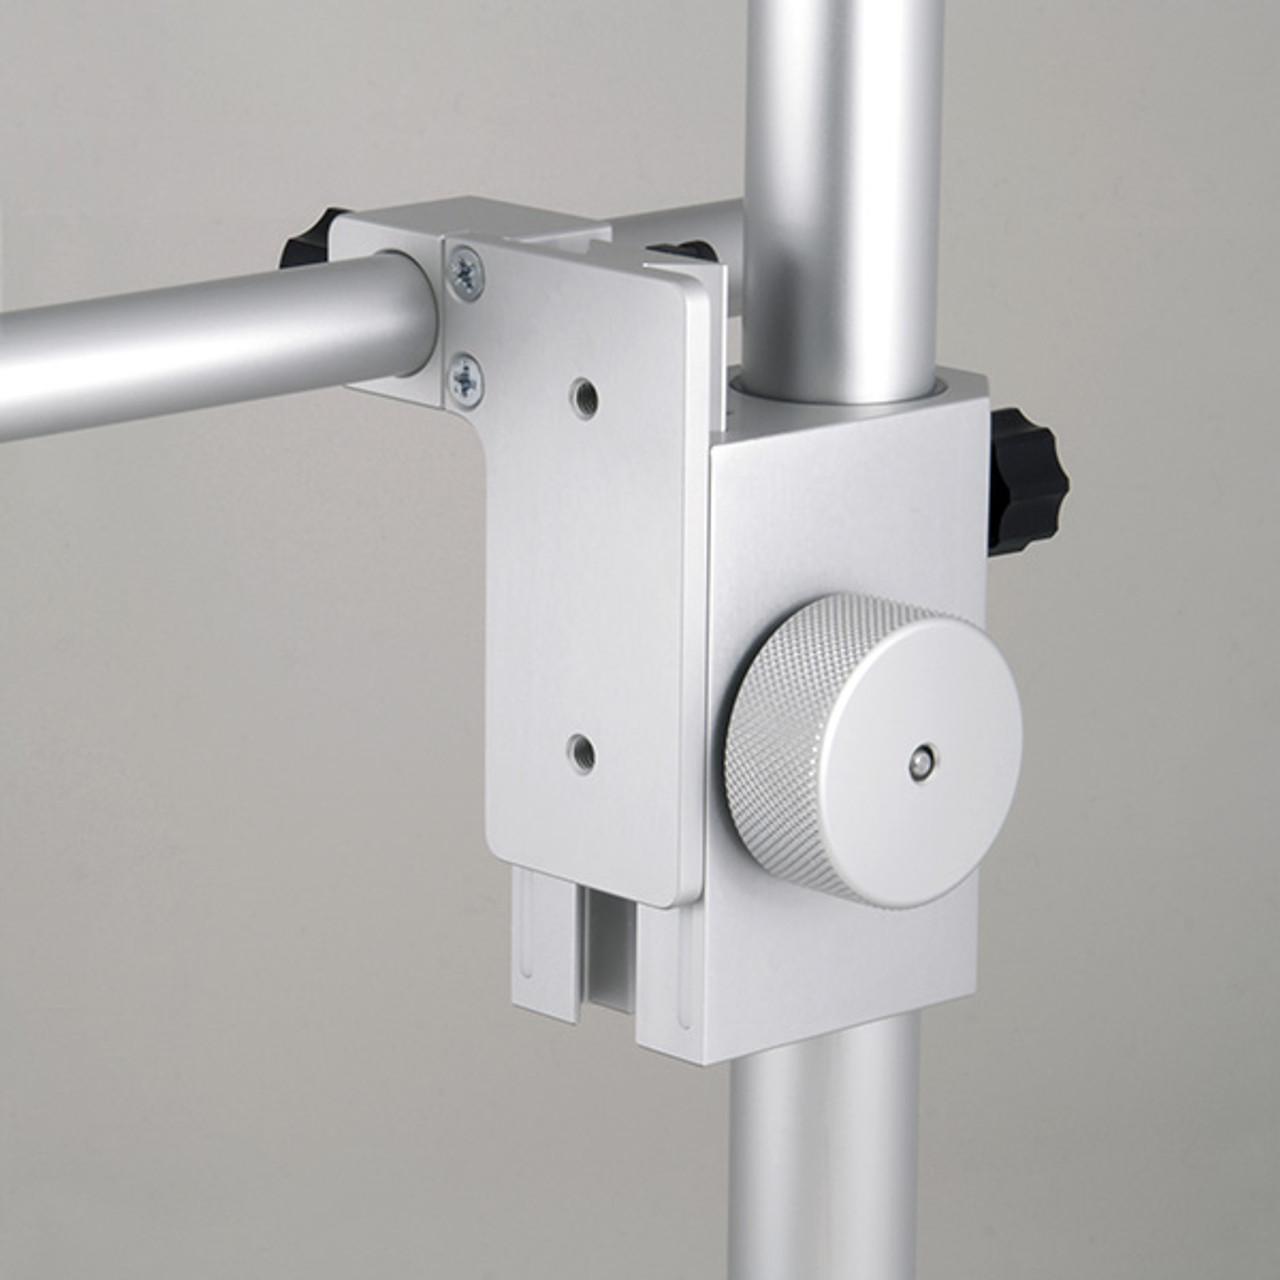 RK-06 Desktop Stand